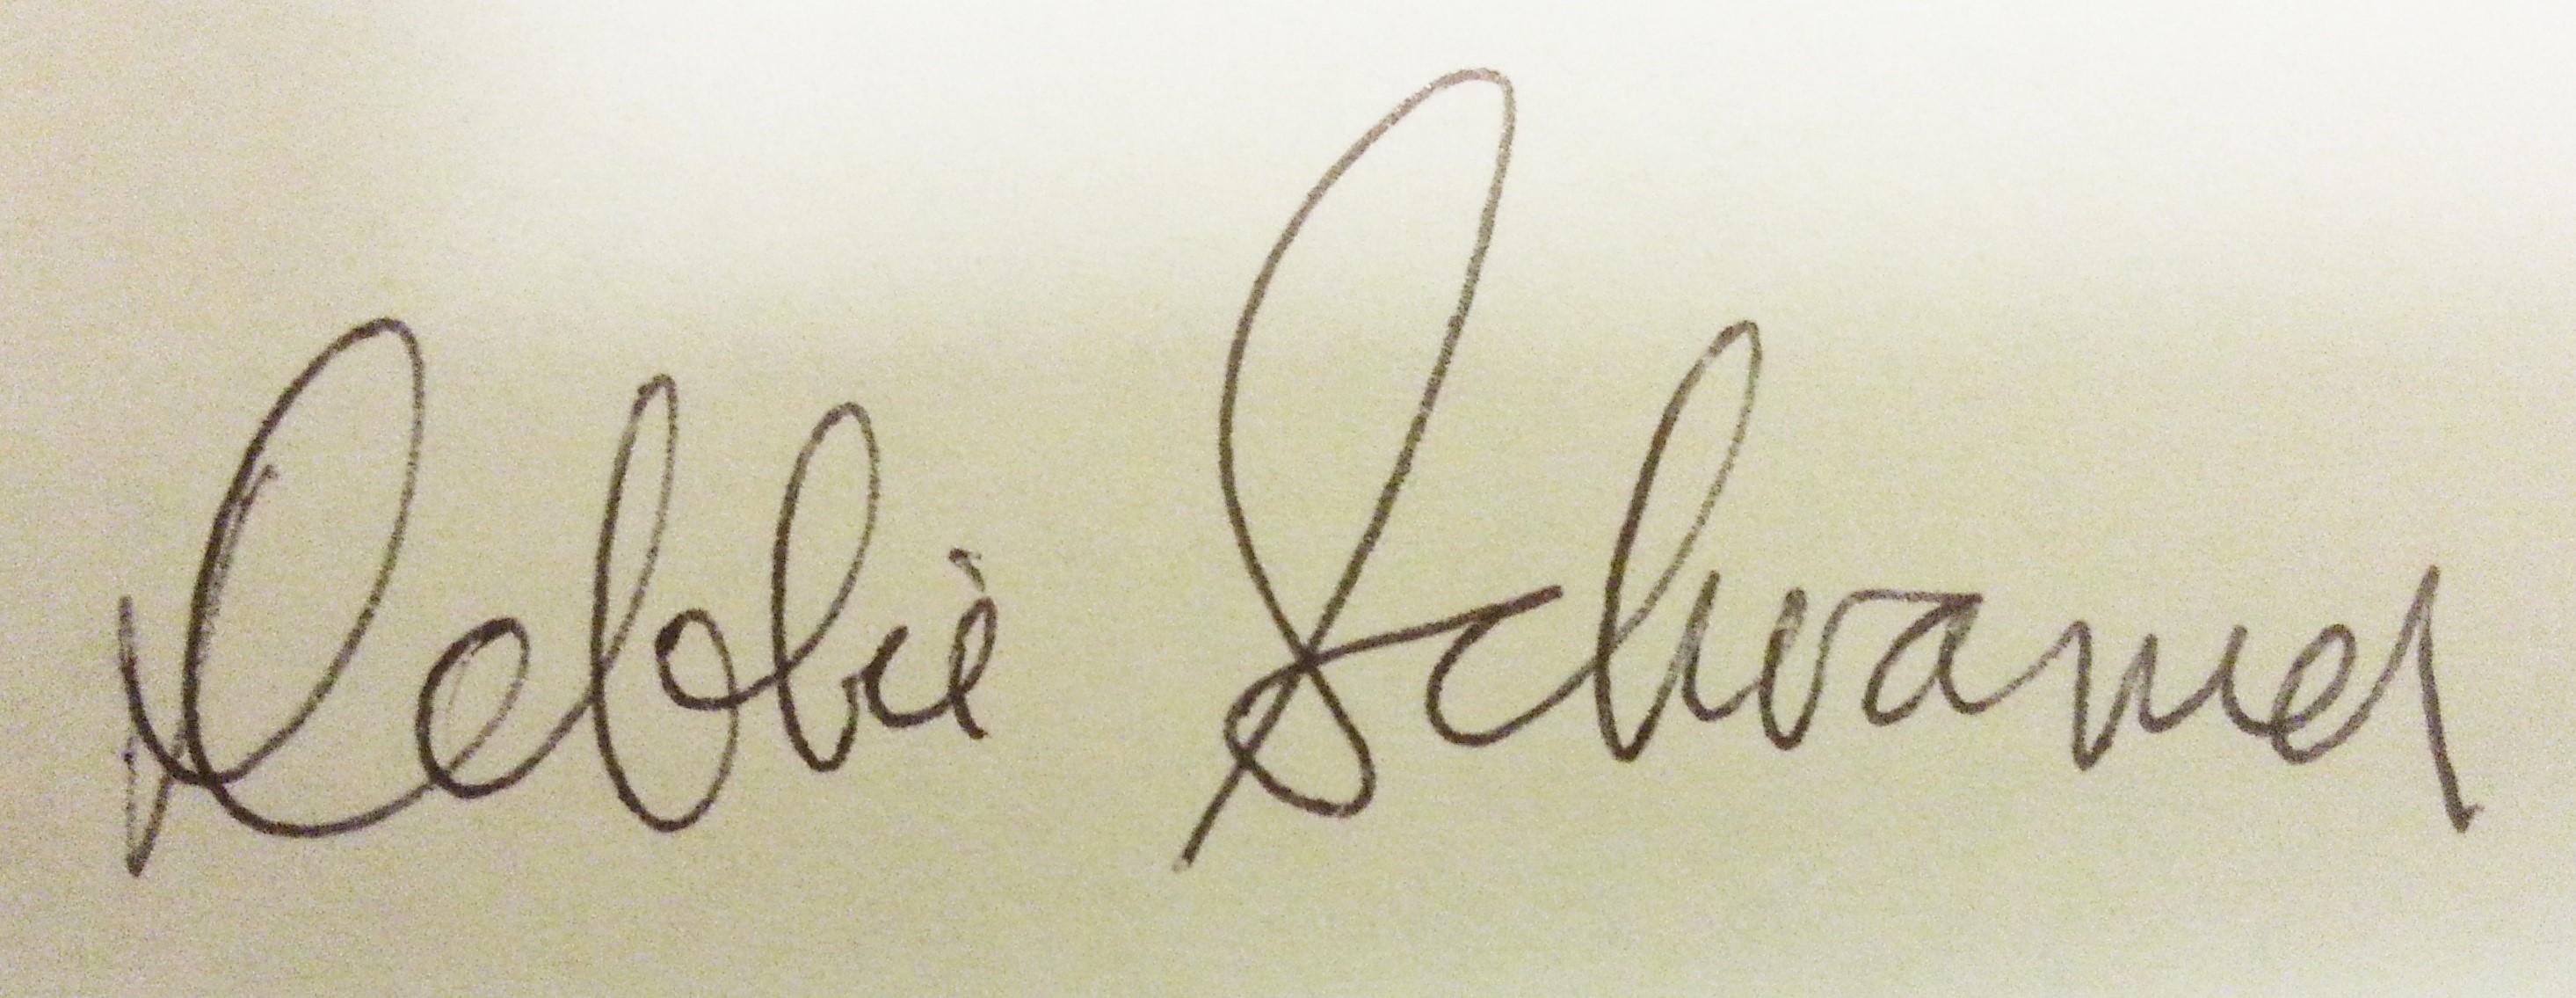 Debbie Schramer's Signature